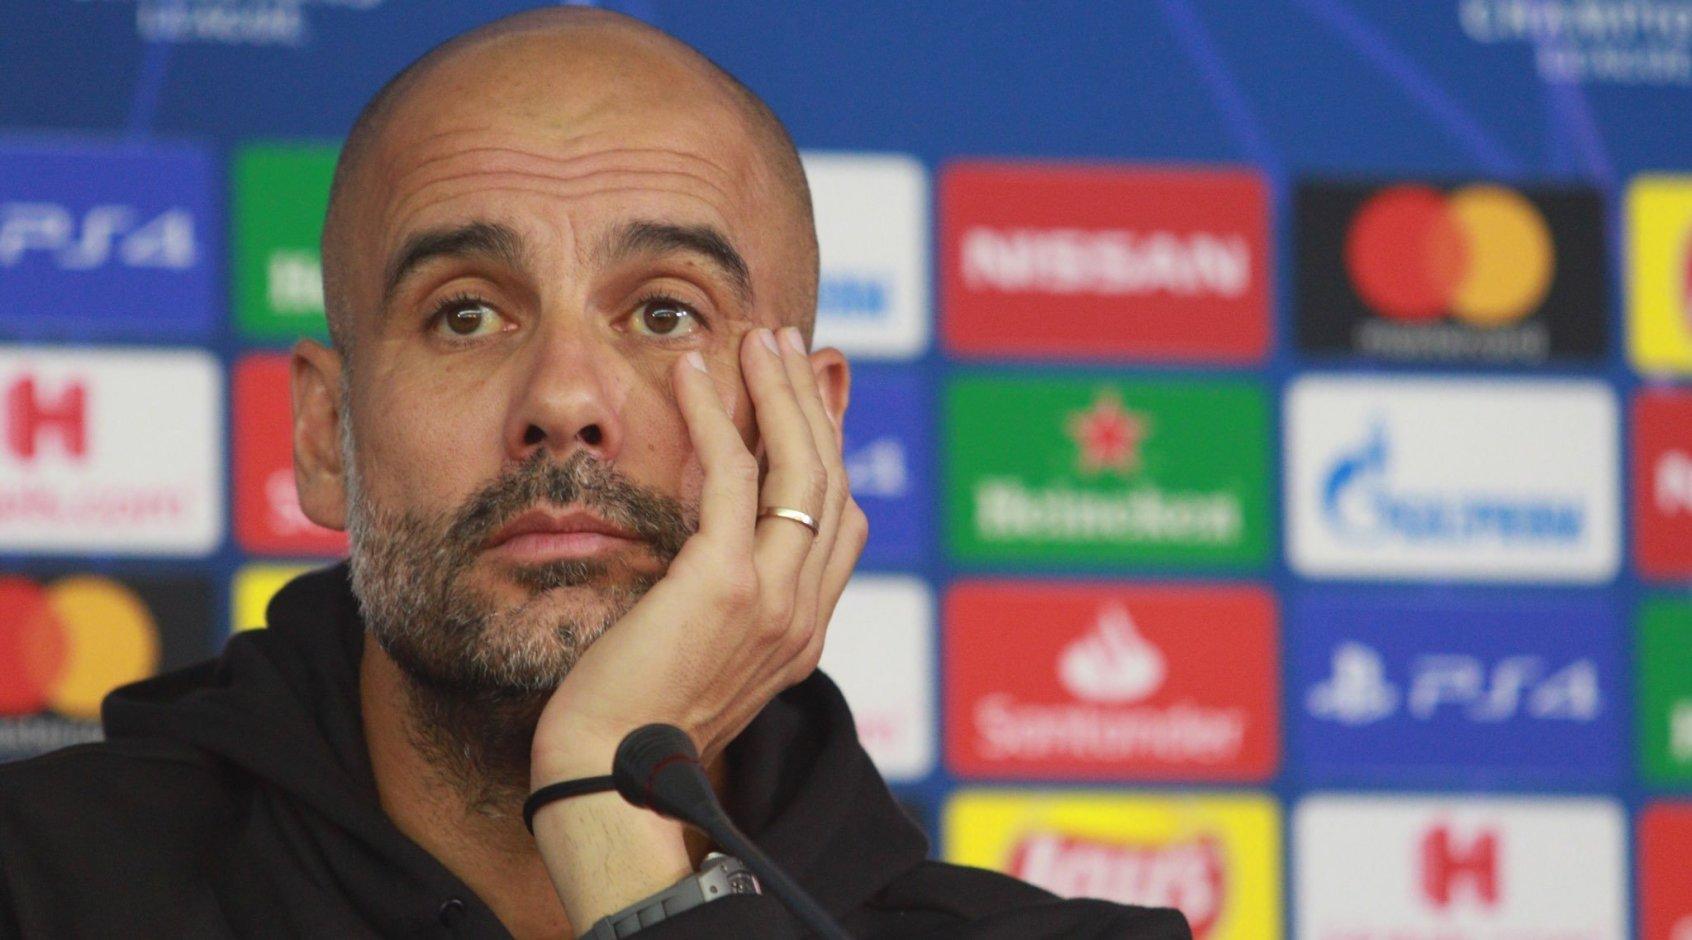 """Шахтер"" - ""Манчестер Сити"": послематчевая пресс-конференция Хосепа Гвардиолы"